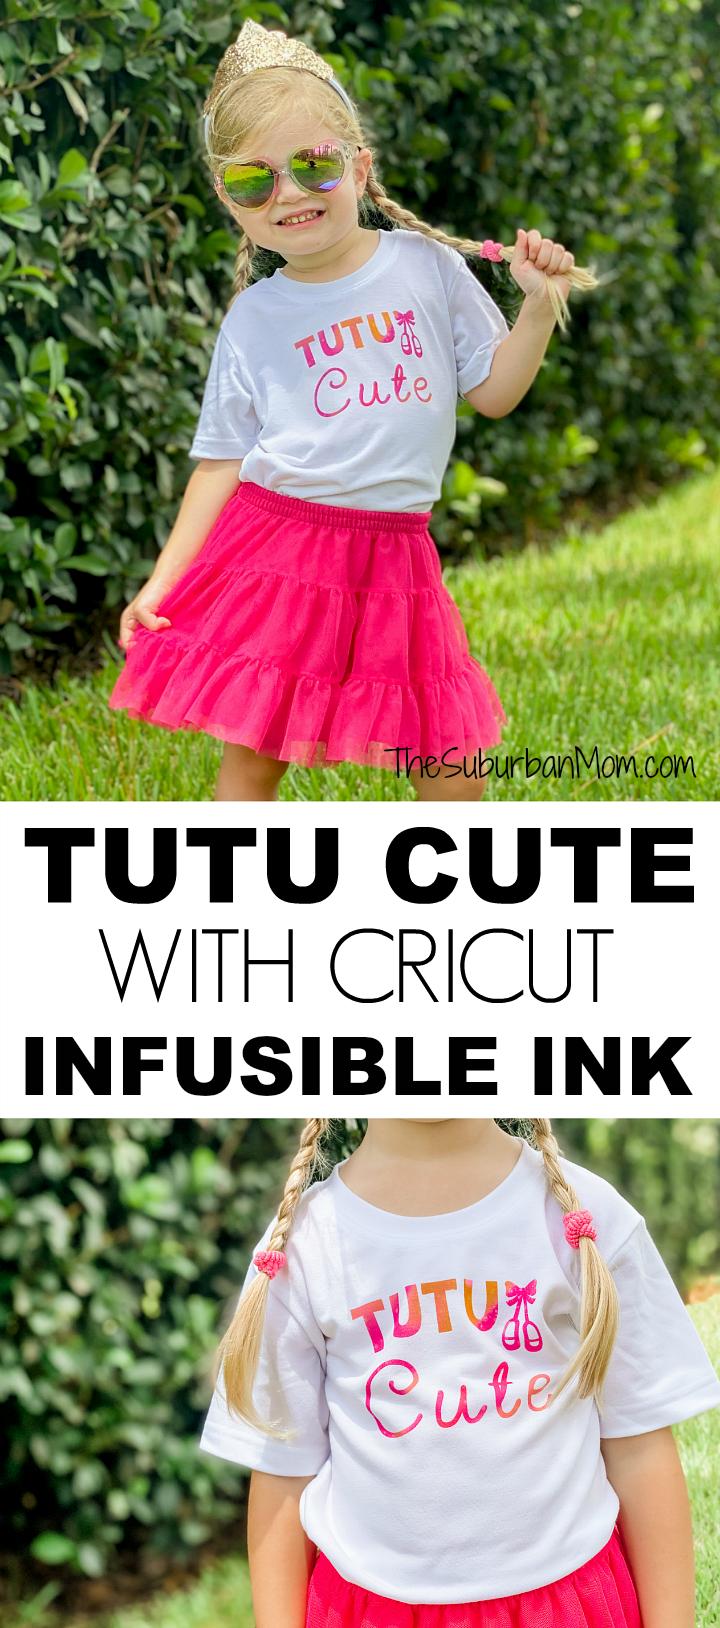 Tutu Cute Cricut Infusible Ink